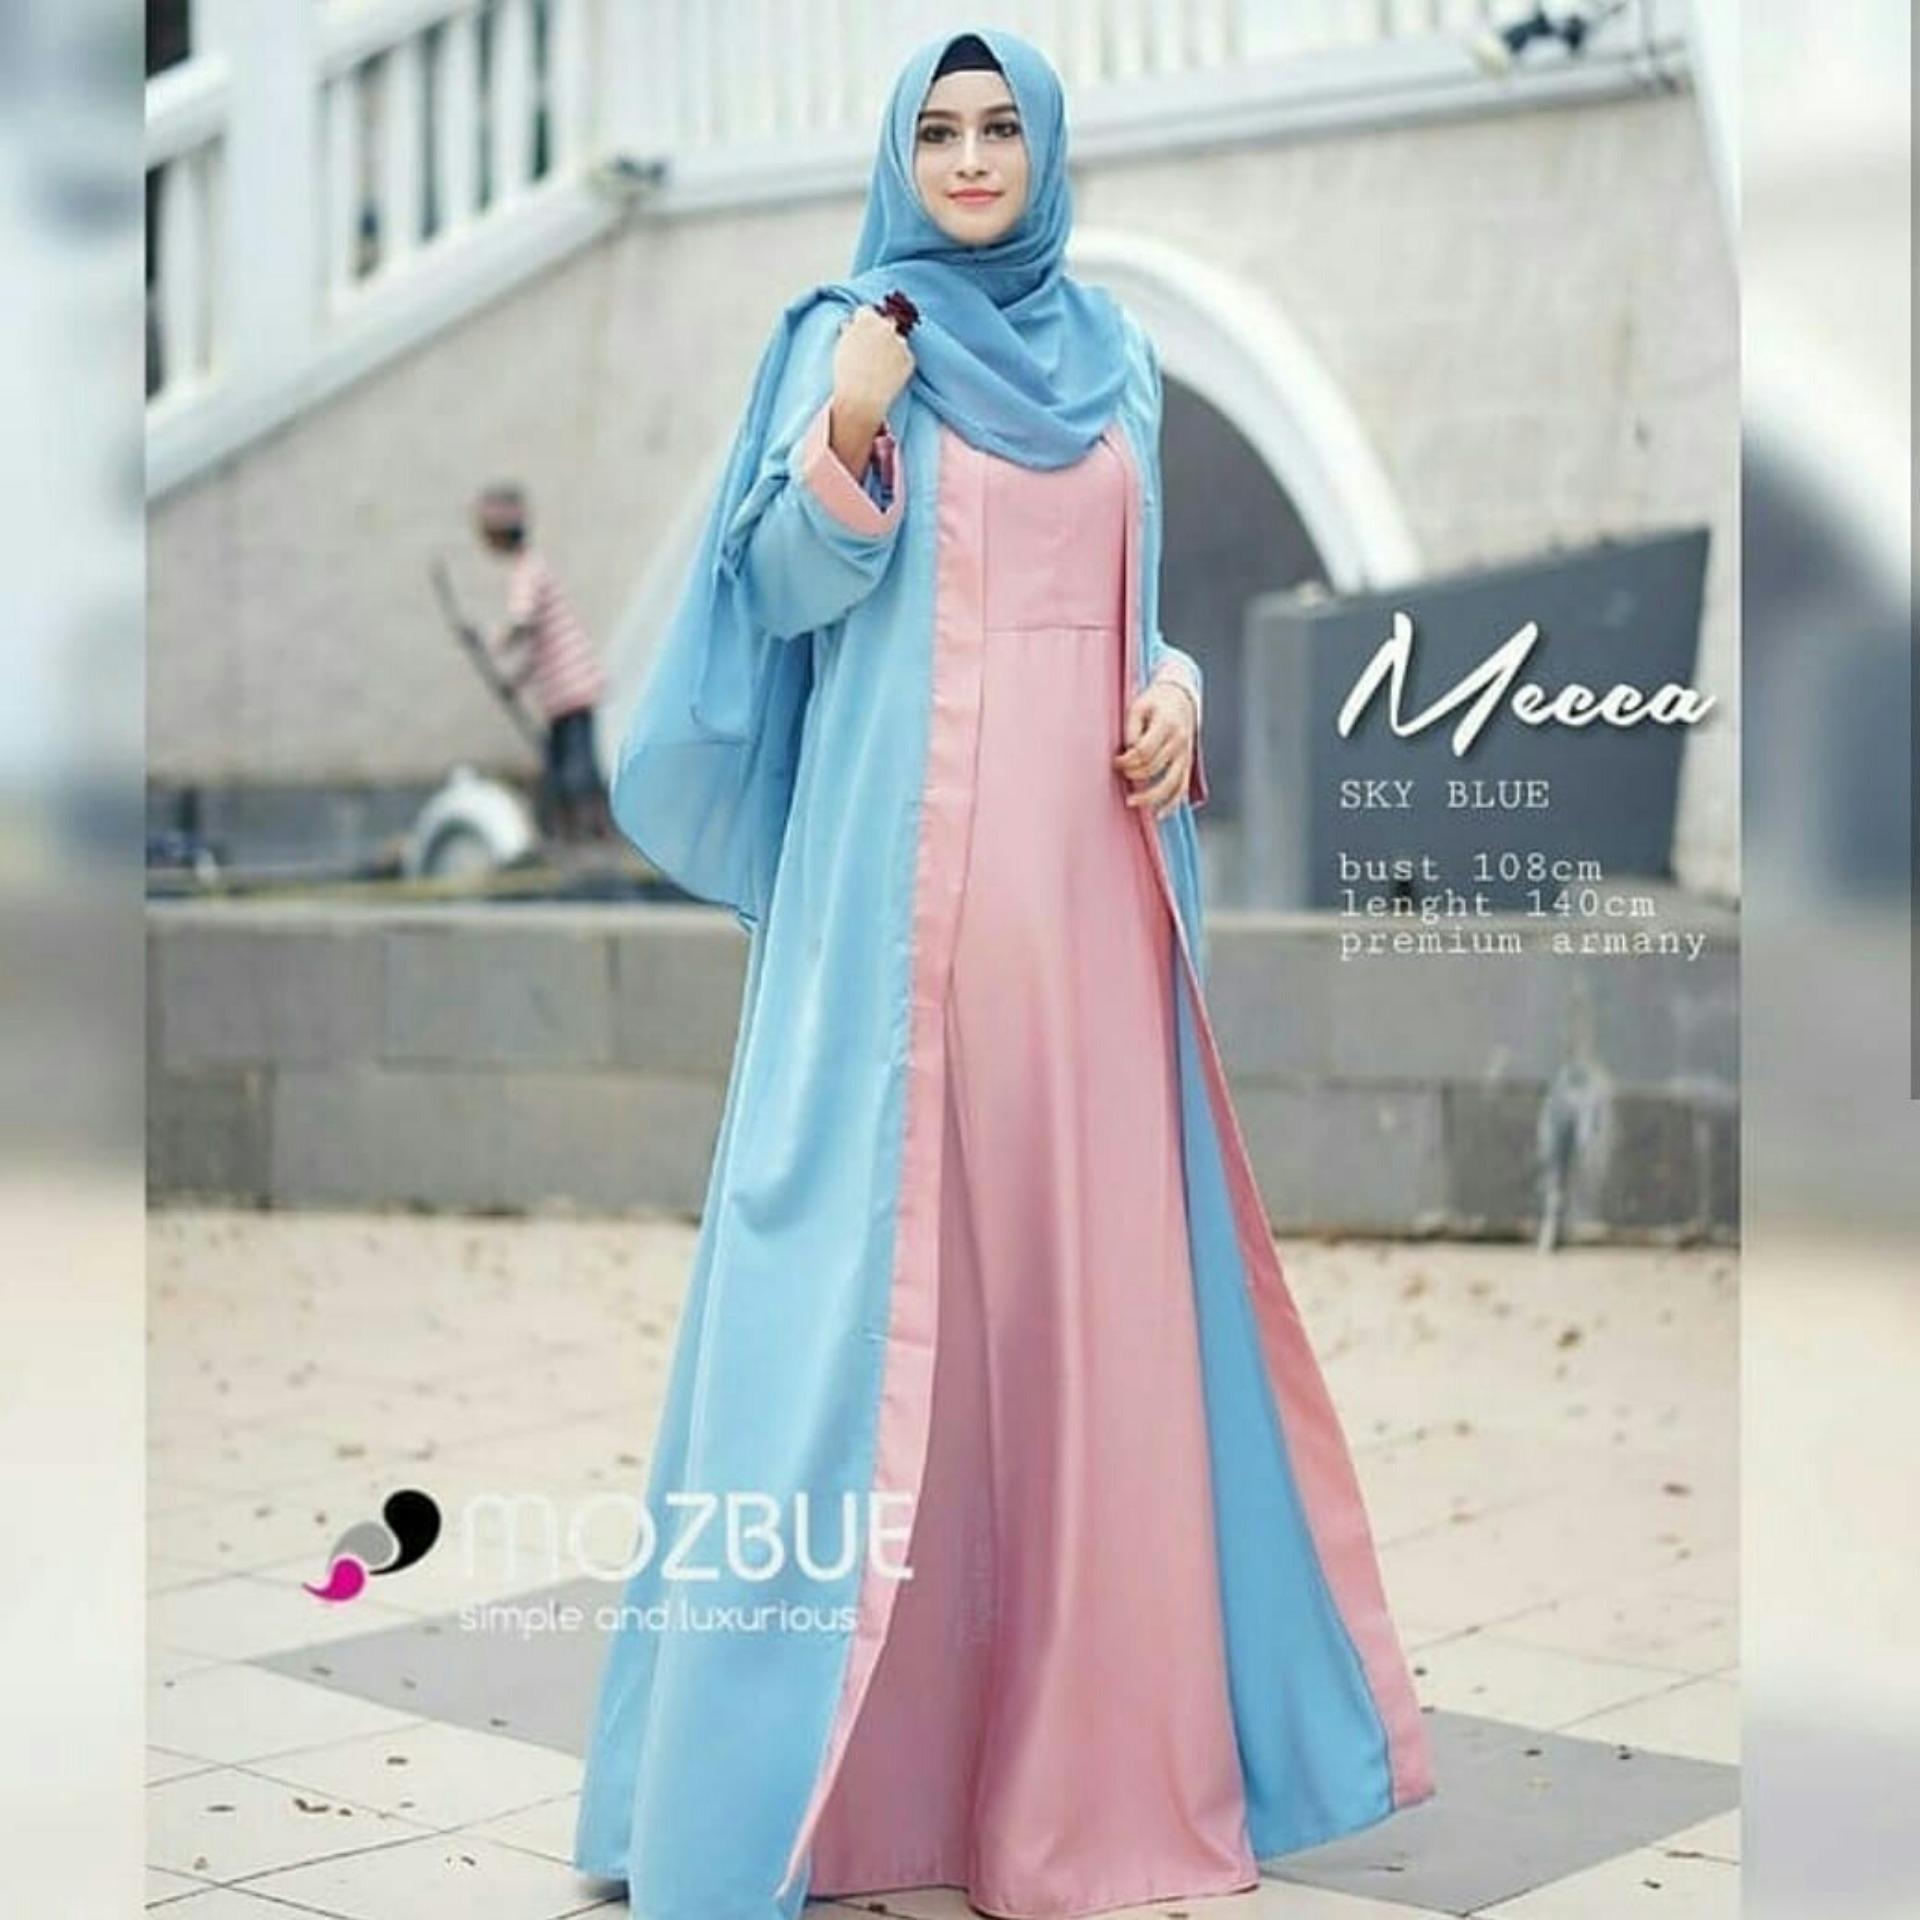 AmorShop Gamis Maxi Mecca /Pakaian Wanita /Long Dress /Pakaian Muslim Wanita